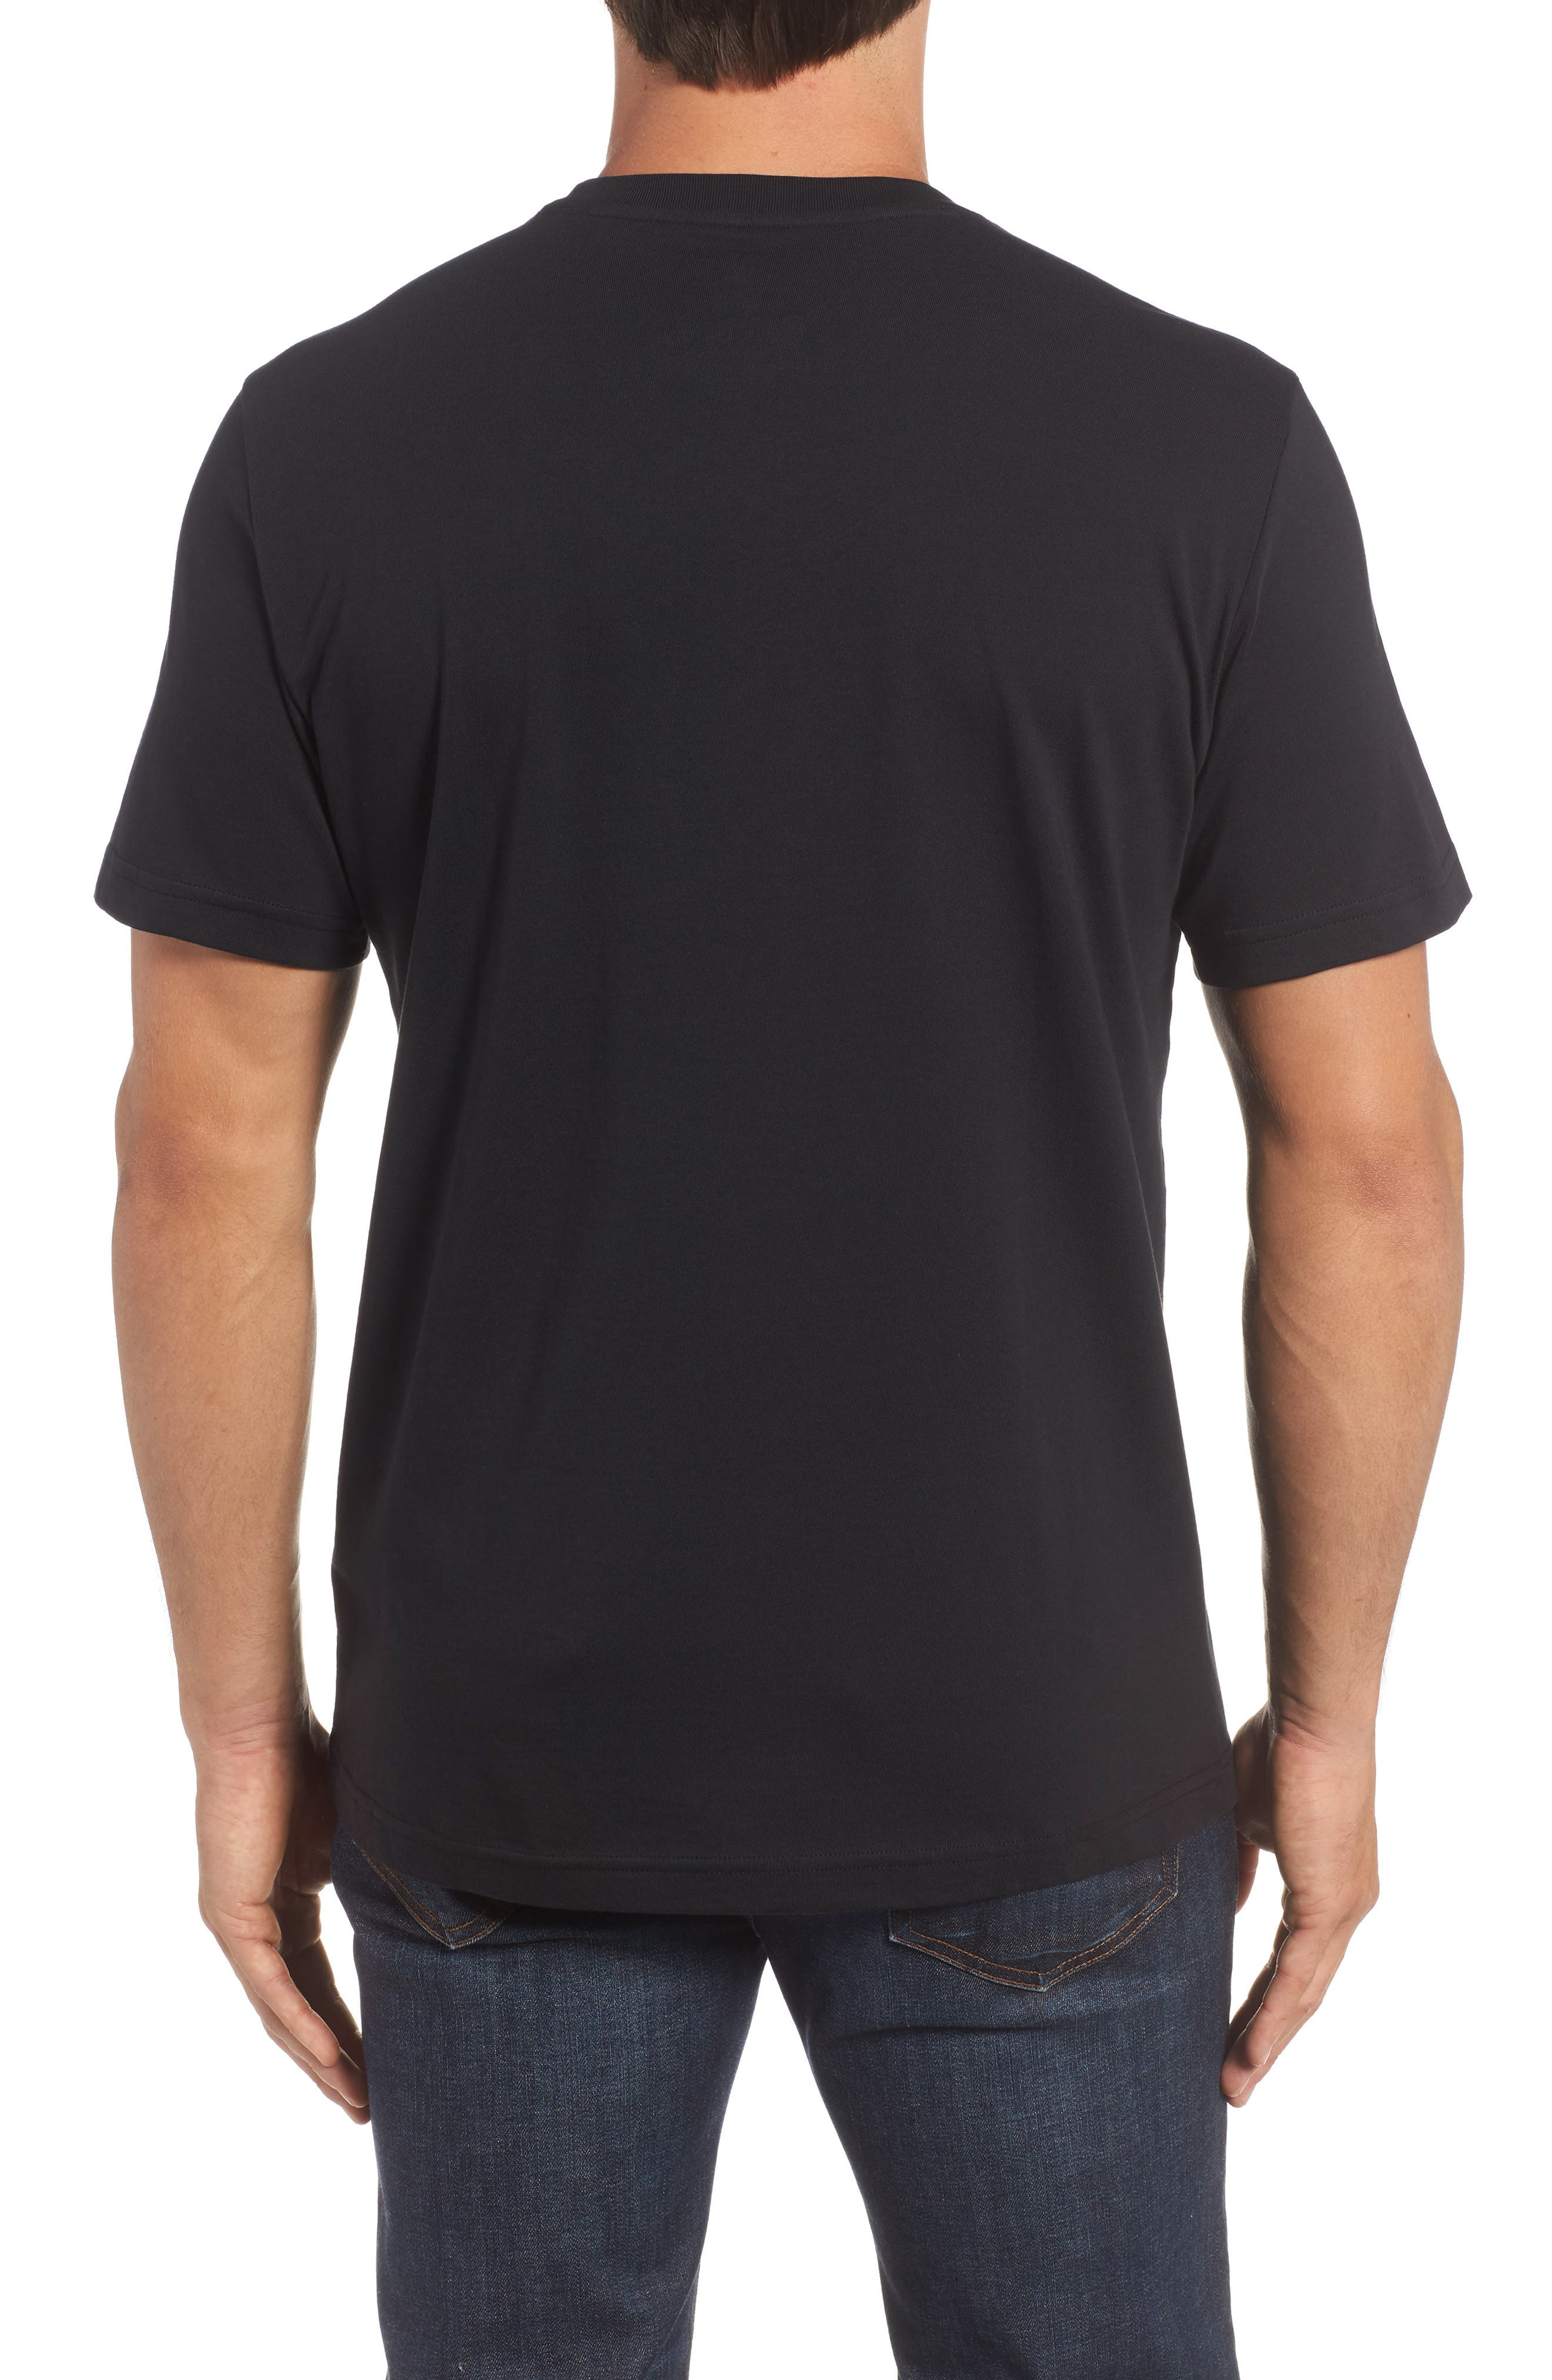 Goldcrown Graphic T-Shirt,                             Alternate thumbnail 2, color,                             001